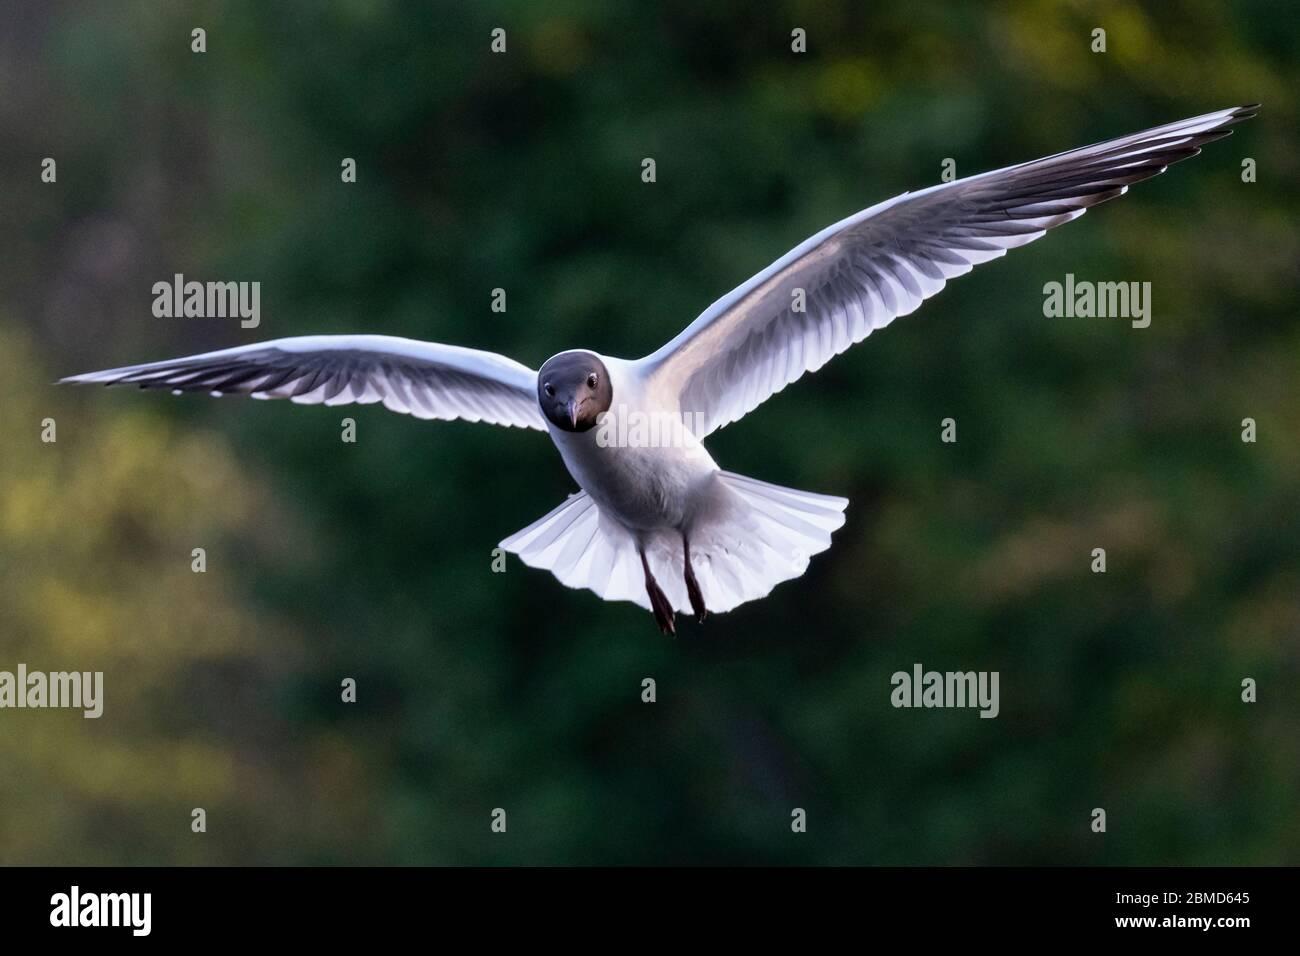 Black-headed gull (Chroicocephalus ridibundus) in summer plumage in flight, Cheshire, England, UK Stock Photo